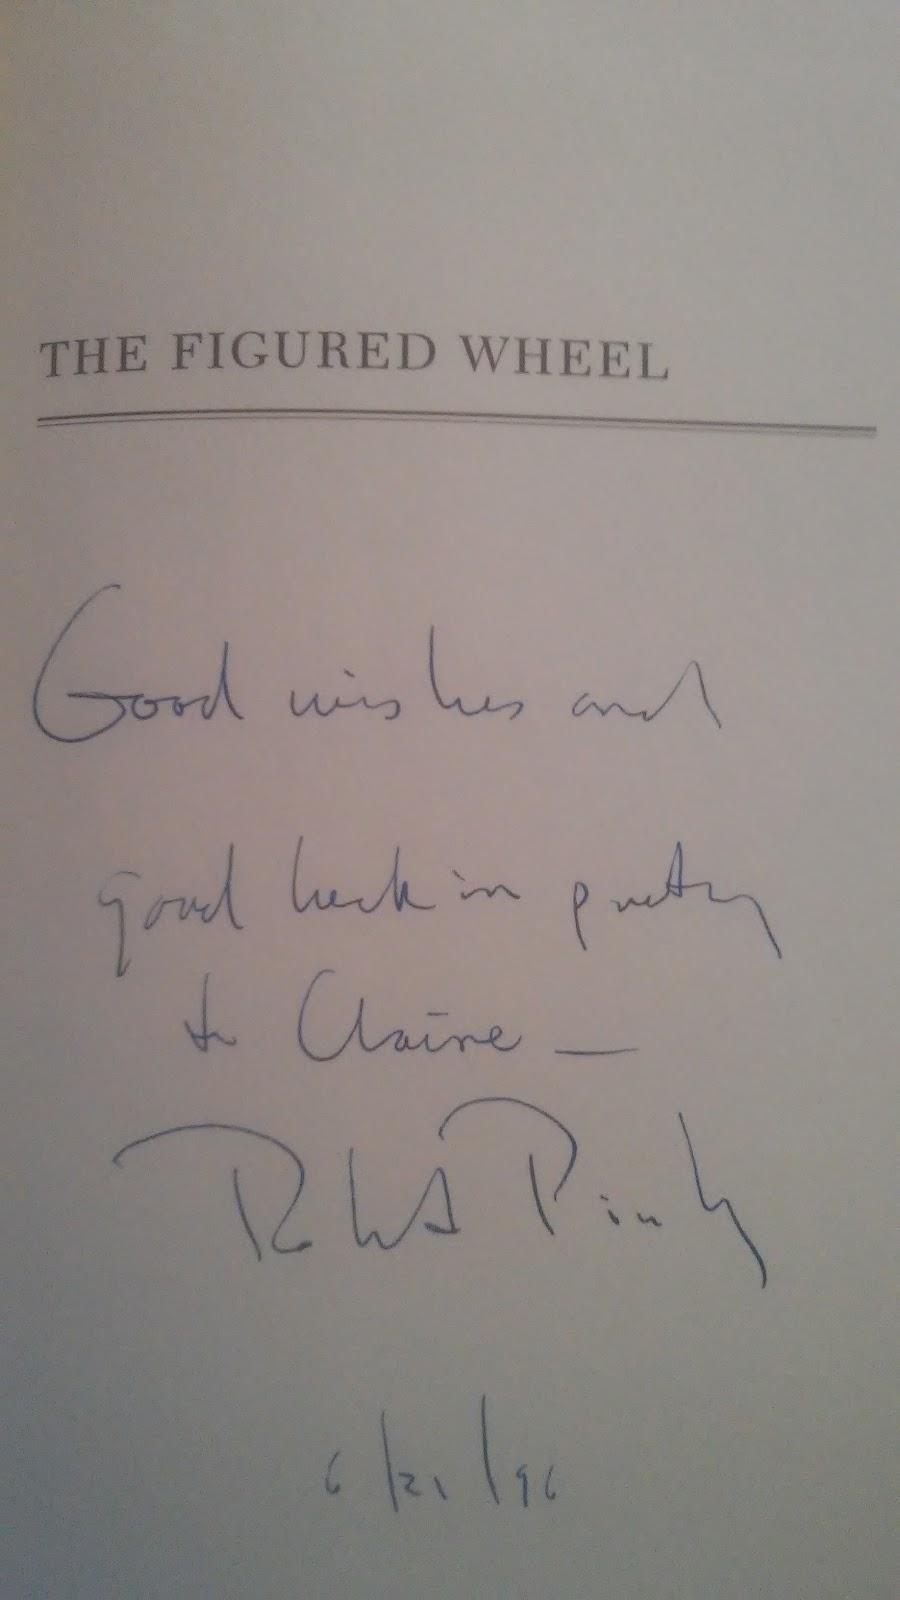 pinsky autograph.jpg